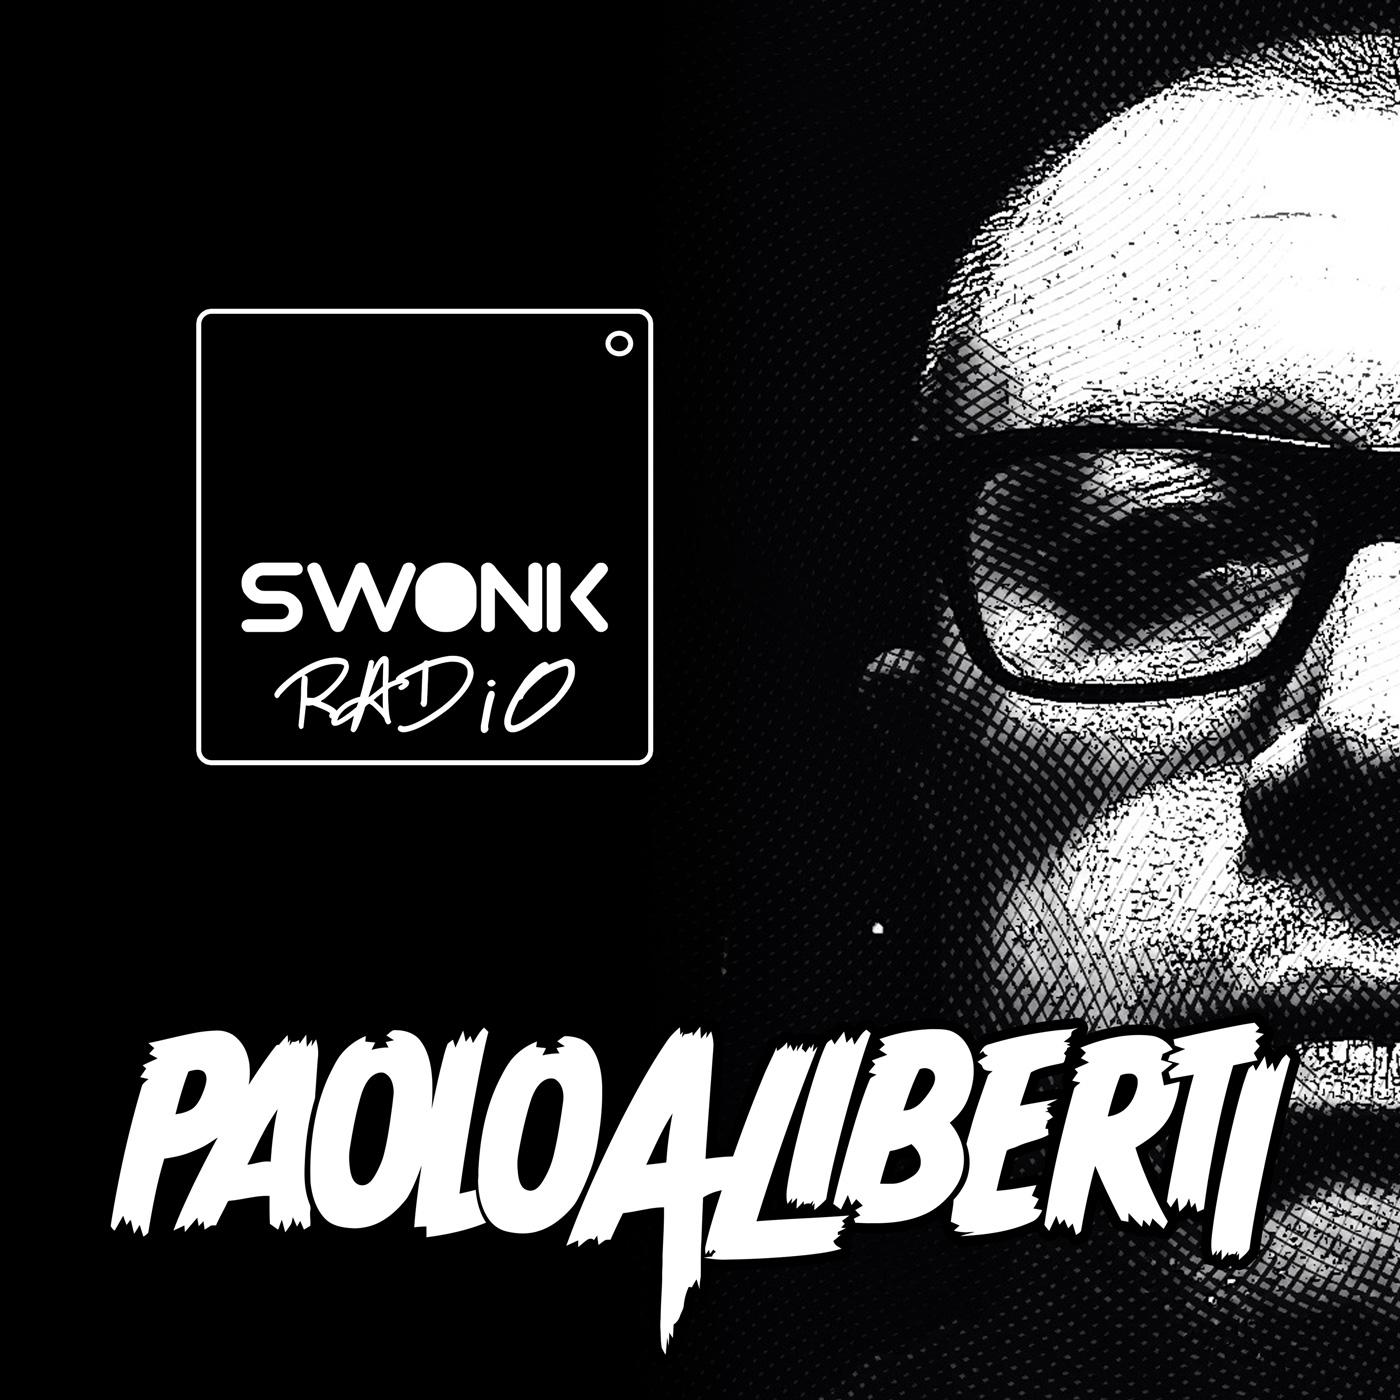 Swonk Radio by Paolo Aliberti